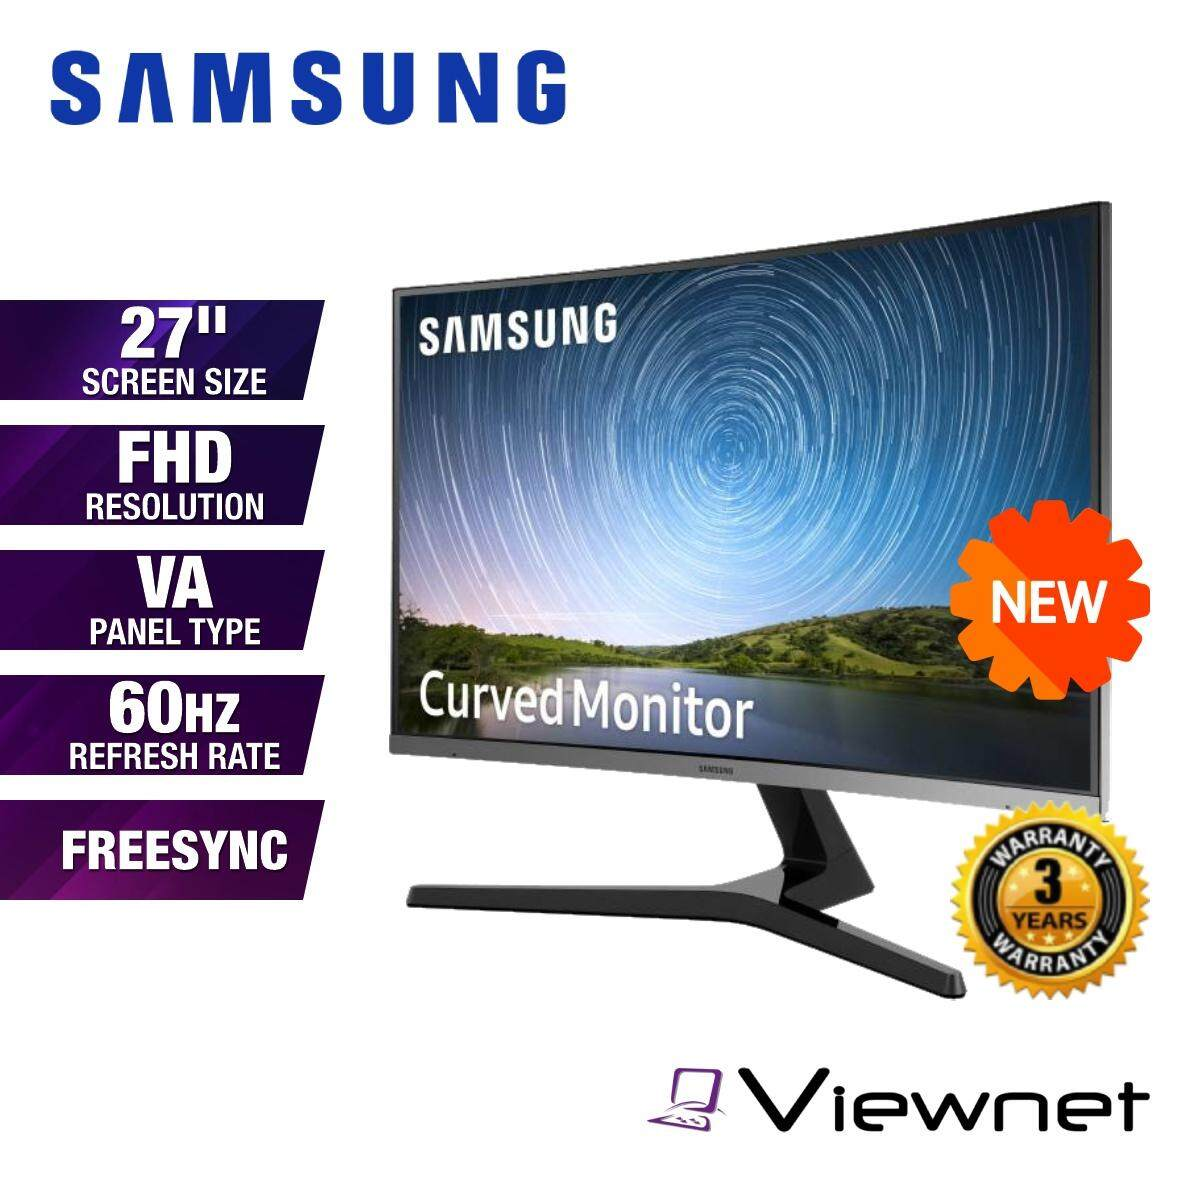 Samsung C27R500FHE 27 Full HD VA 60Hz 4ms FreeSync Curved LED Monitor (LC27R500FHEXXM) VGA, HDMI 1.4, Headphone Jack, VESA Compatible, Eye Saver Mode, Flicker Free Malaysia